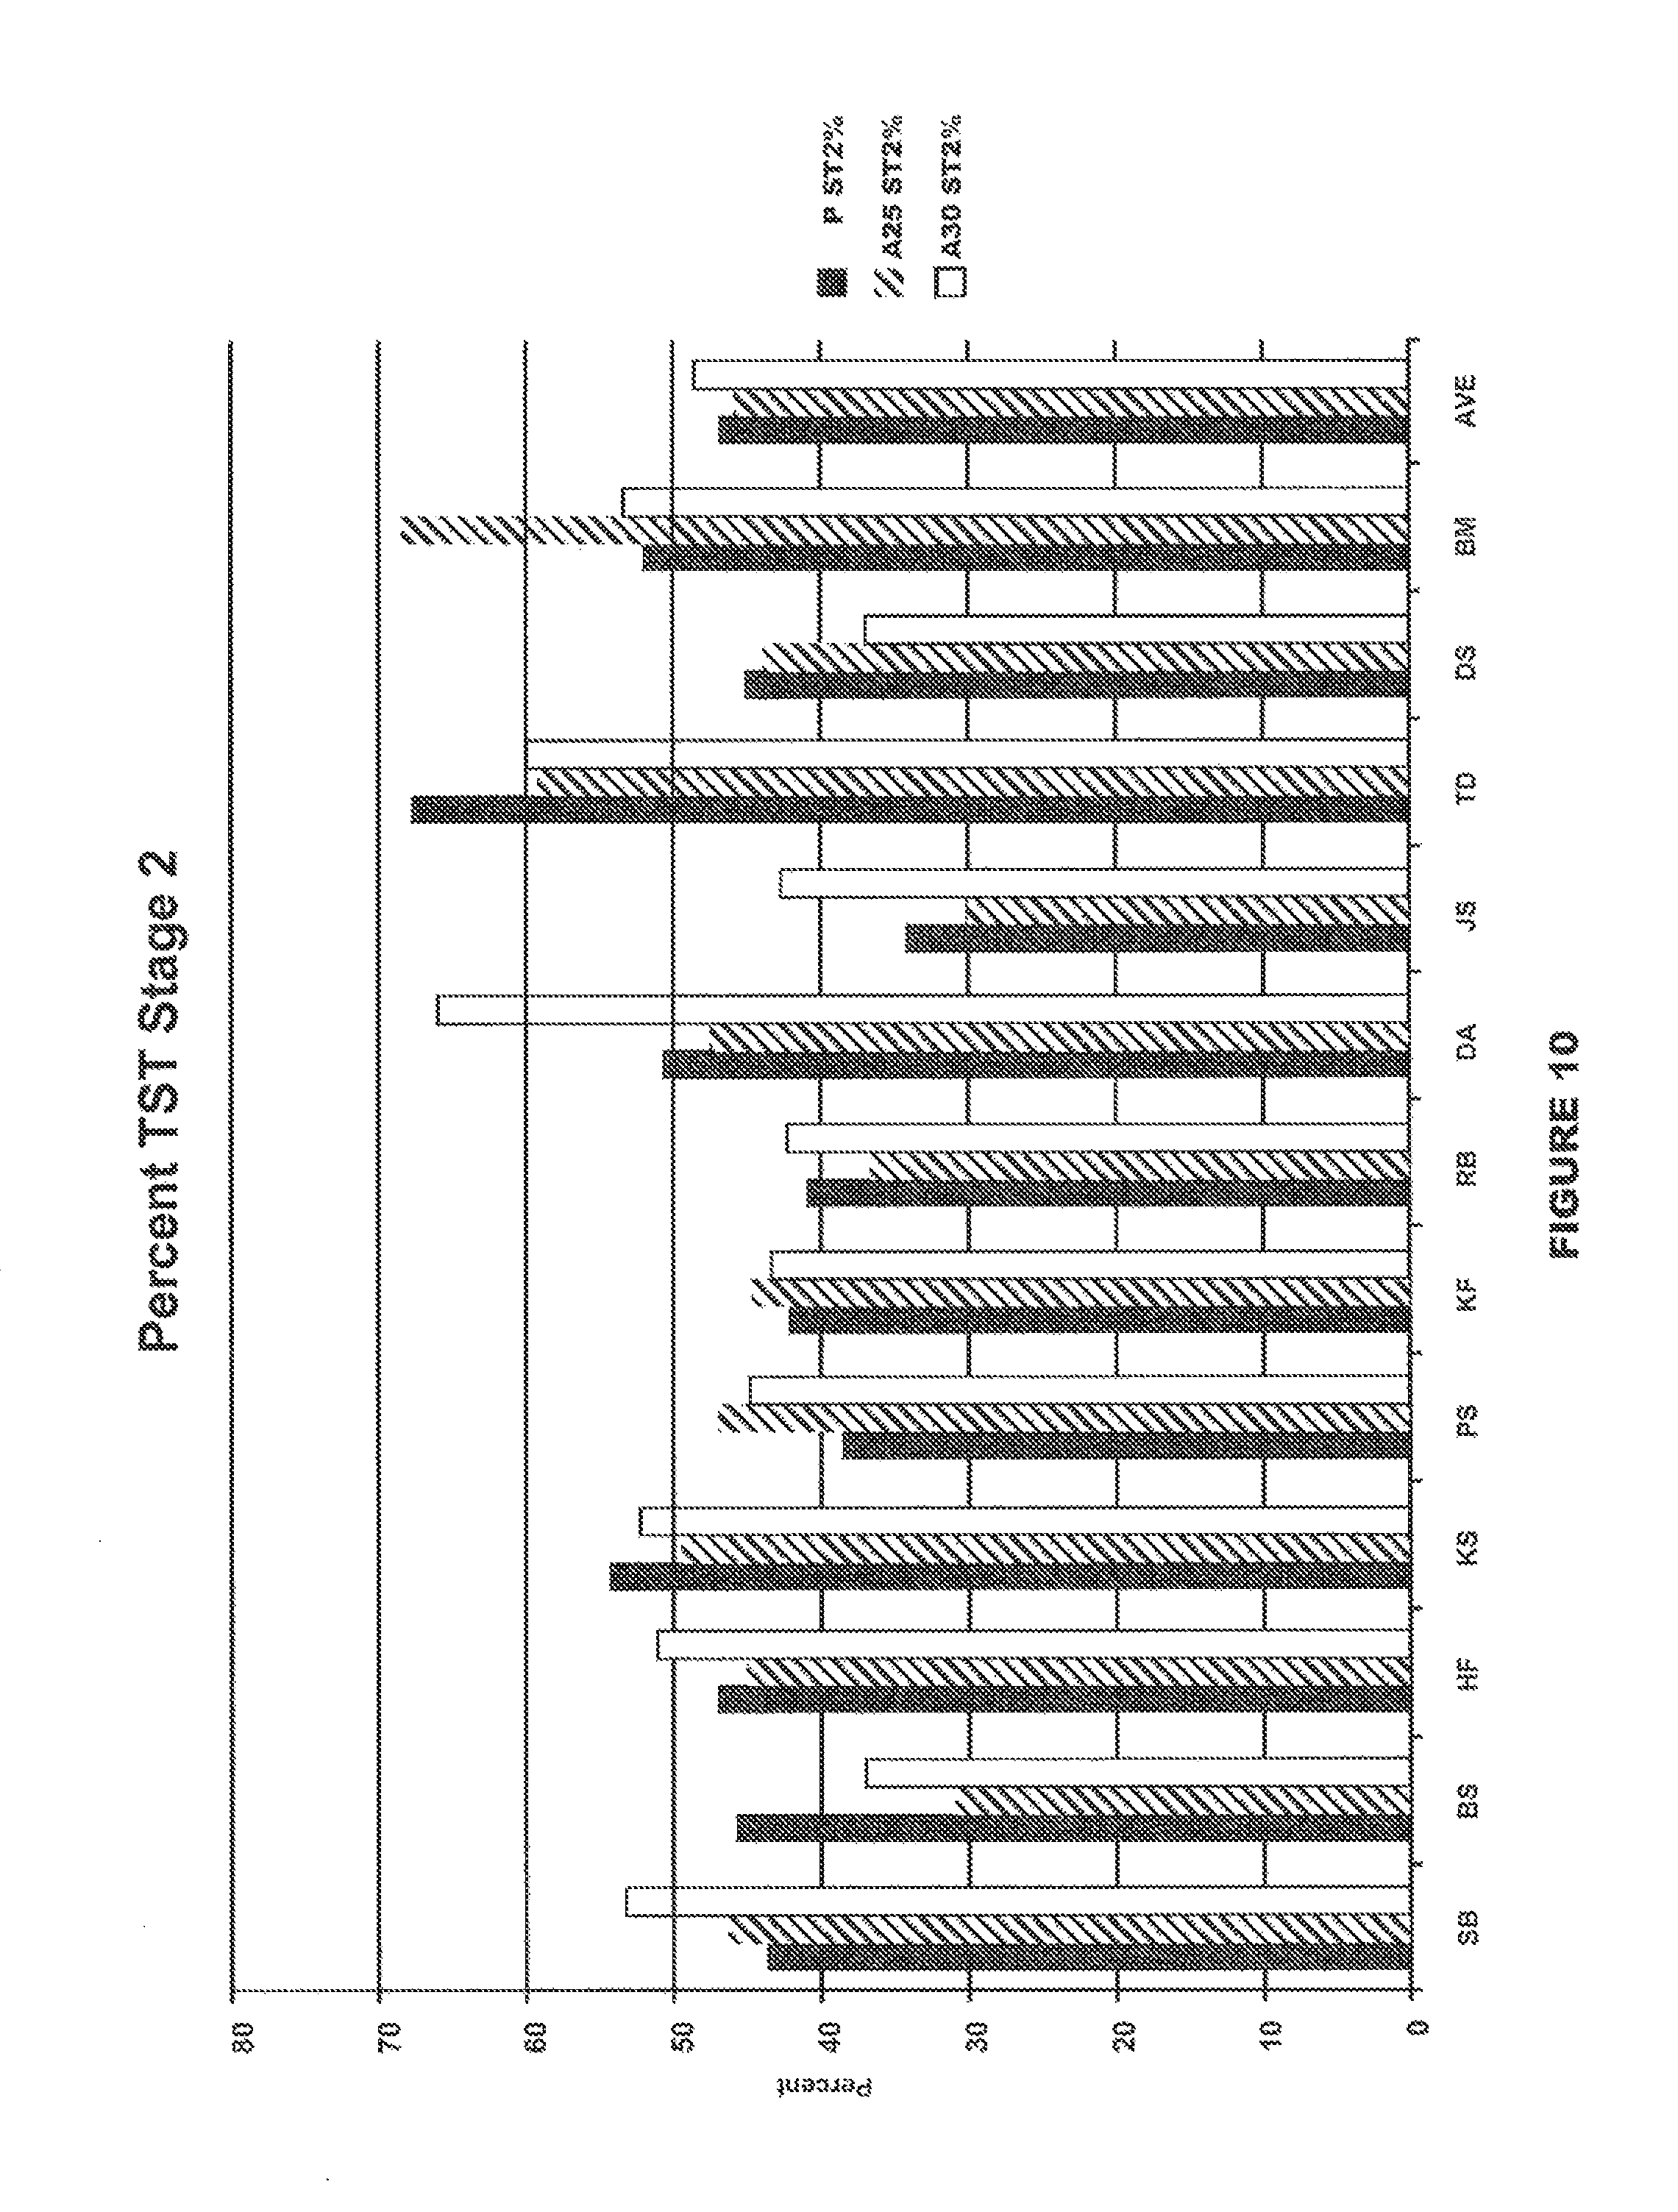 Patent US 10,238,684 B2